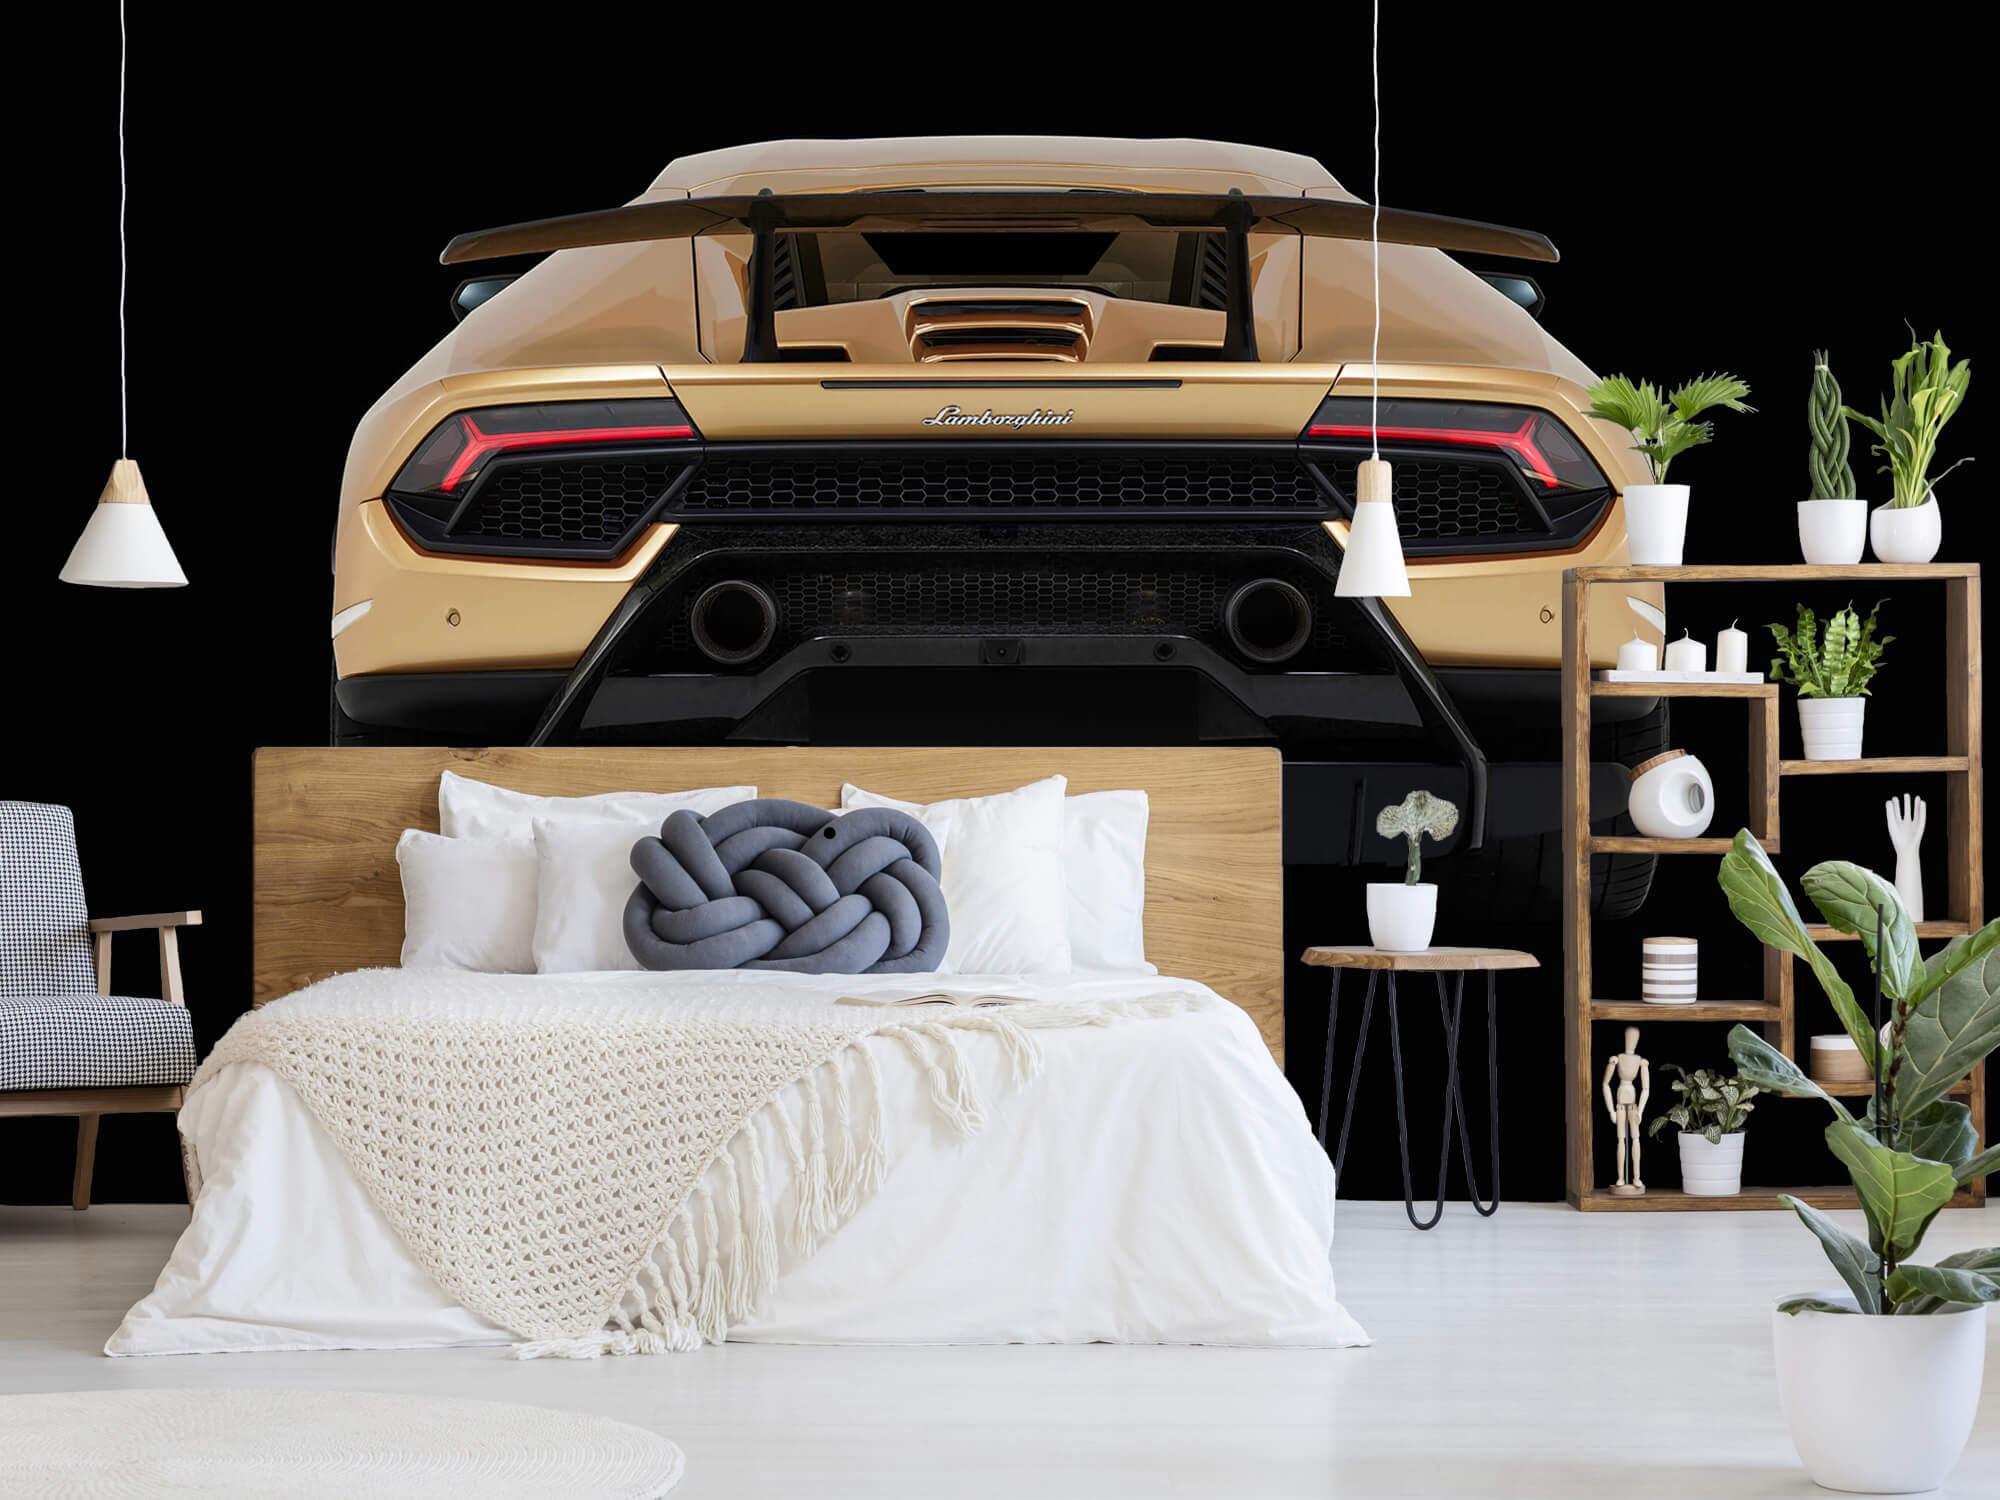 Wallpaper Lamborghini Huracán - Rear view, black 1